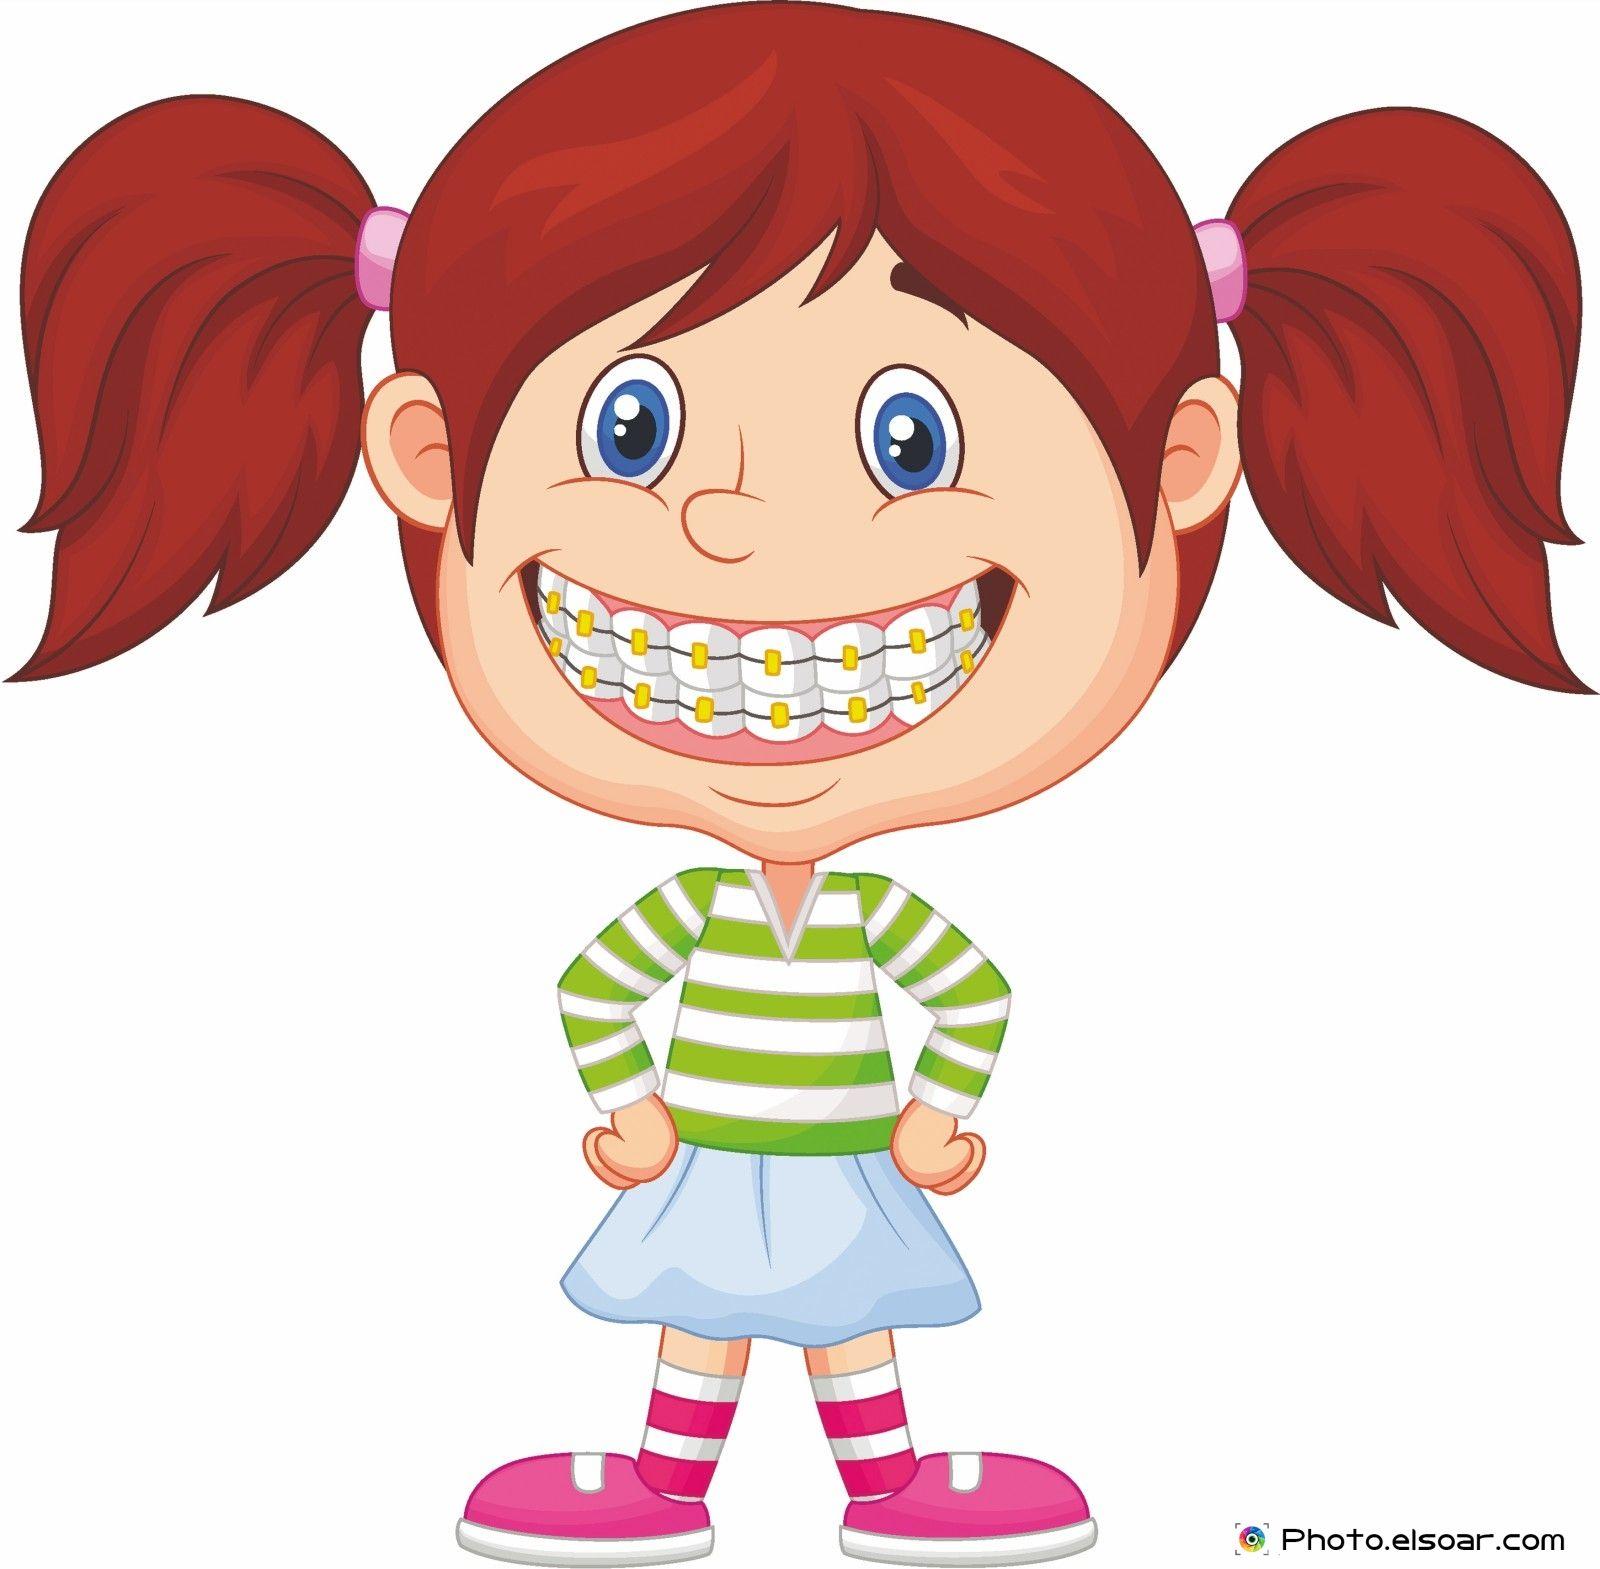 15 Funny Cartoon Kids Pictures Elsoar Little Girl Cartoon Girl Cartoon Cartoon Kids